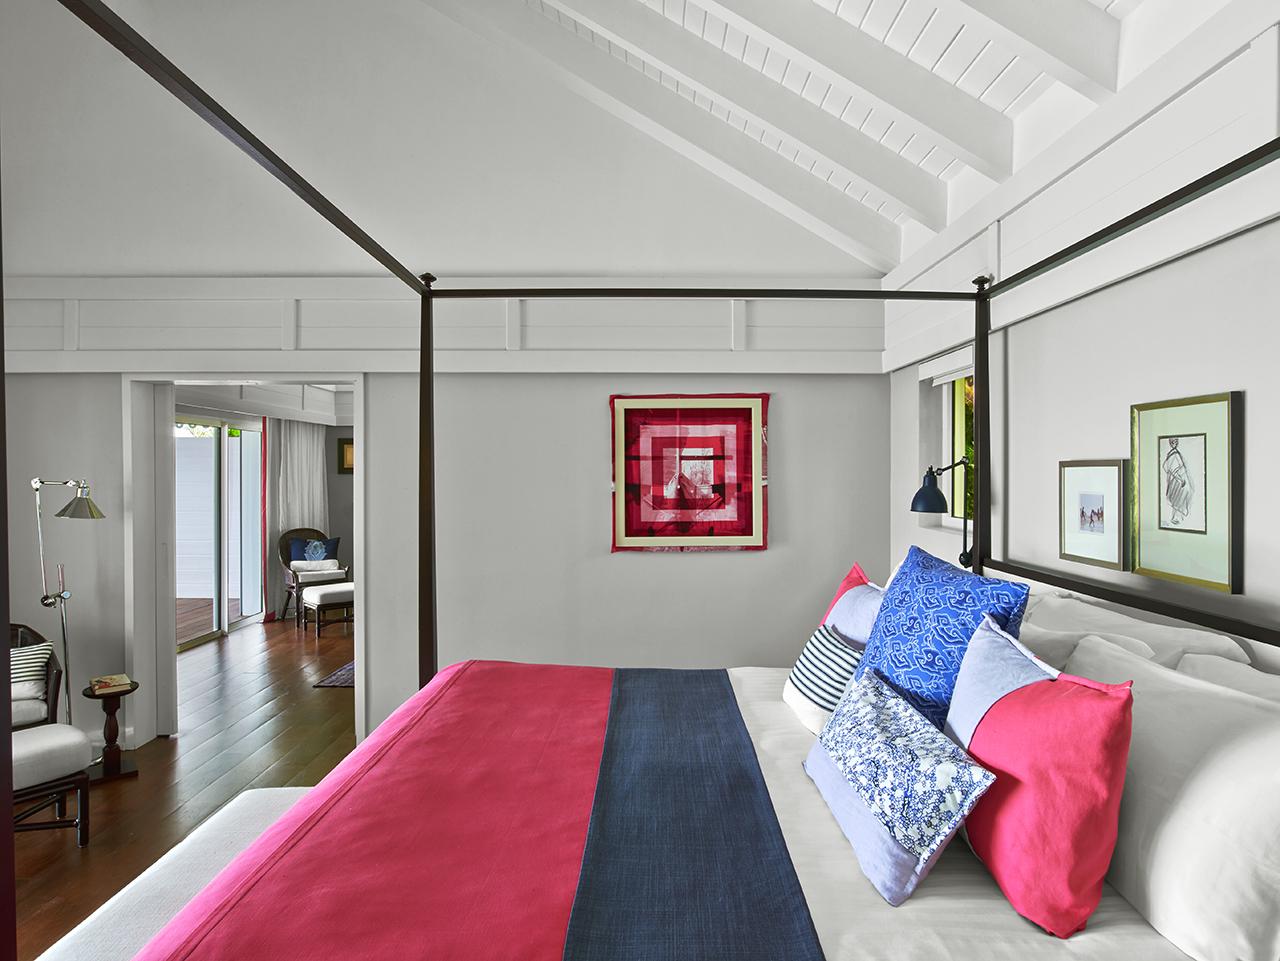 luis-pons-design-interior-tropical-hotel-stbarths_15.jpg